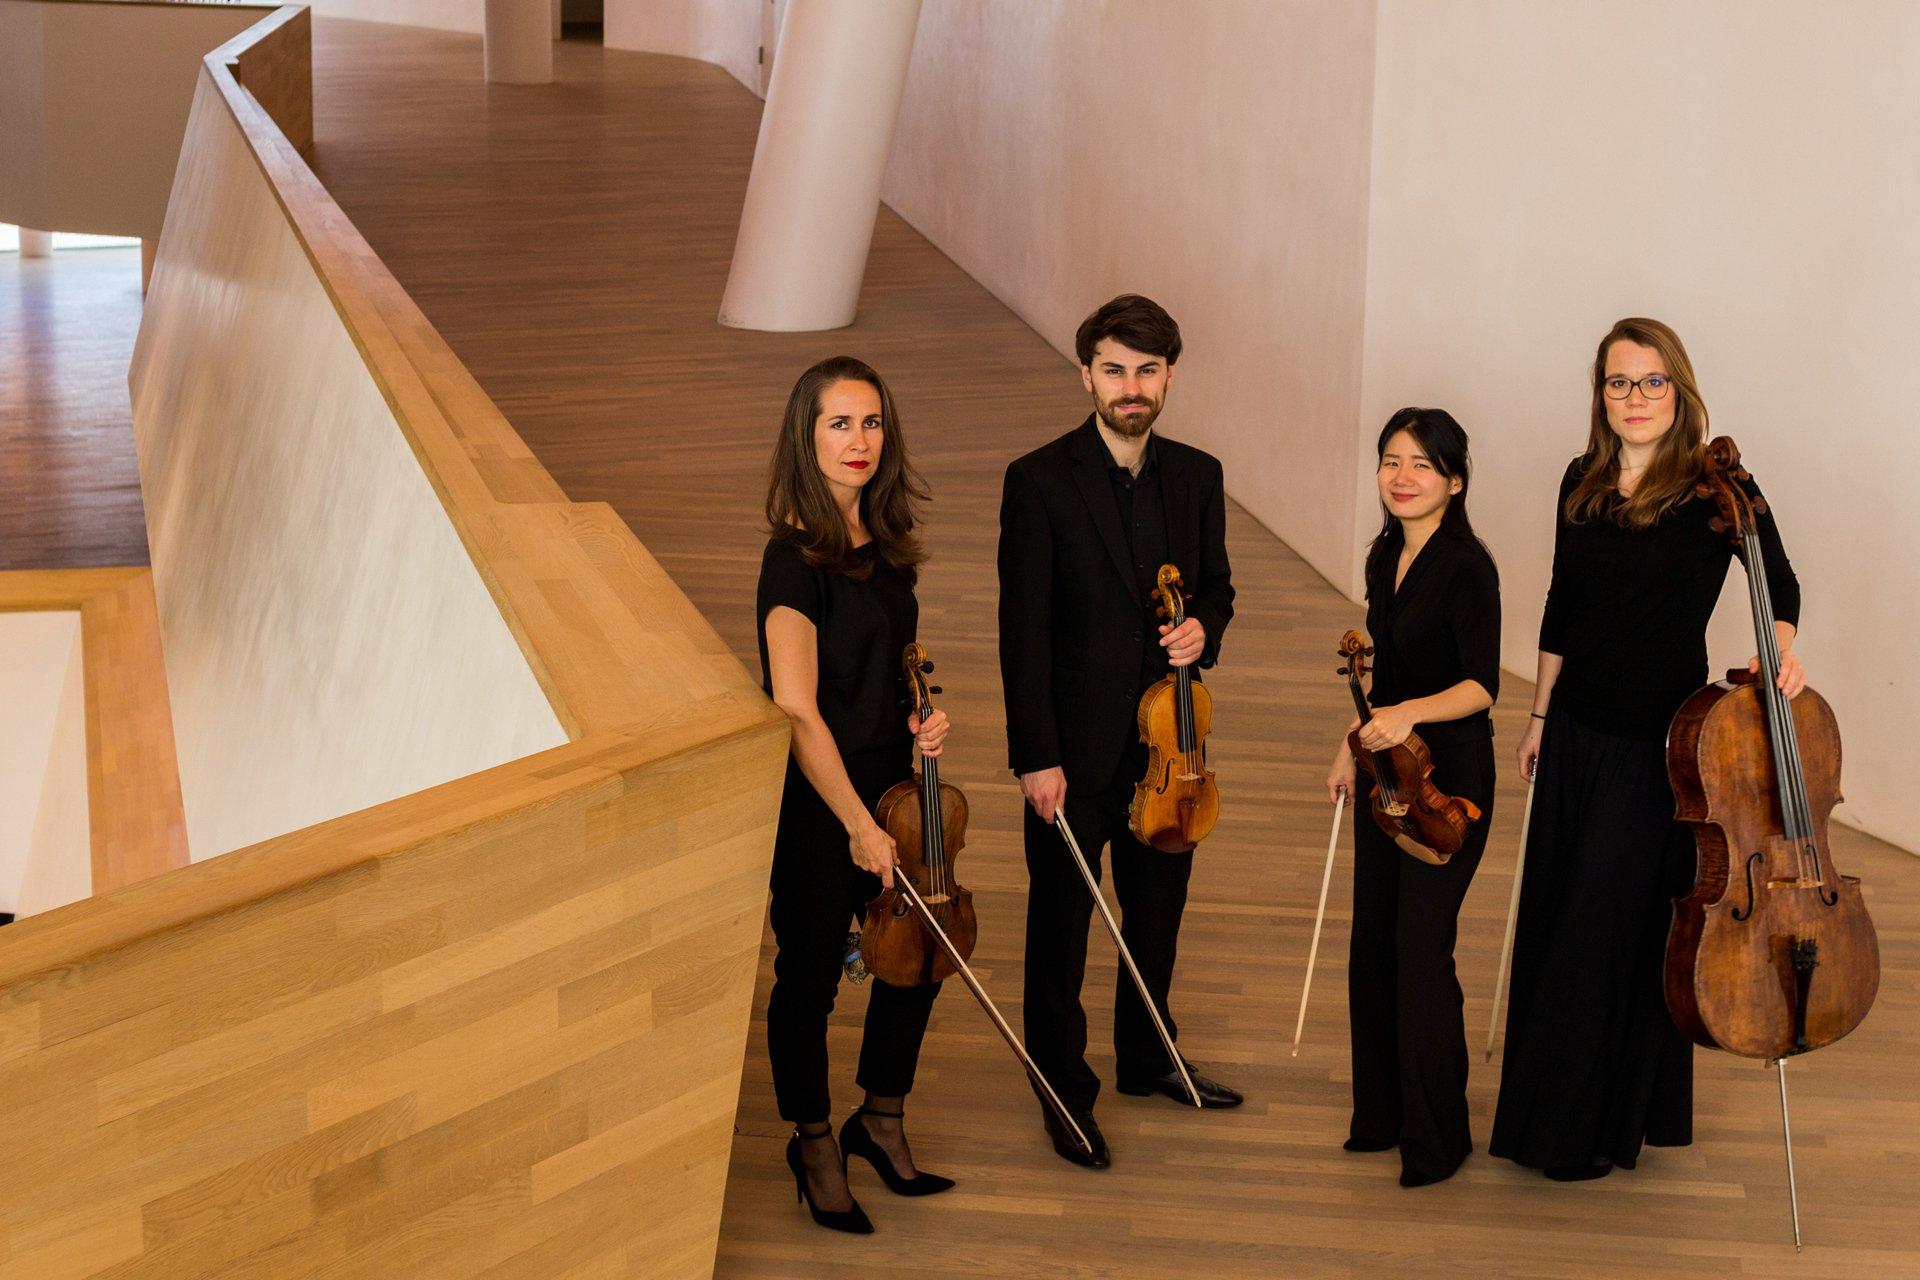 Ndr Mediathek Elbphilharmonie